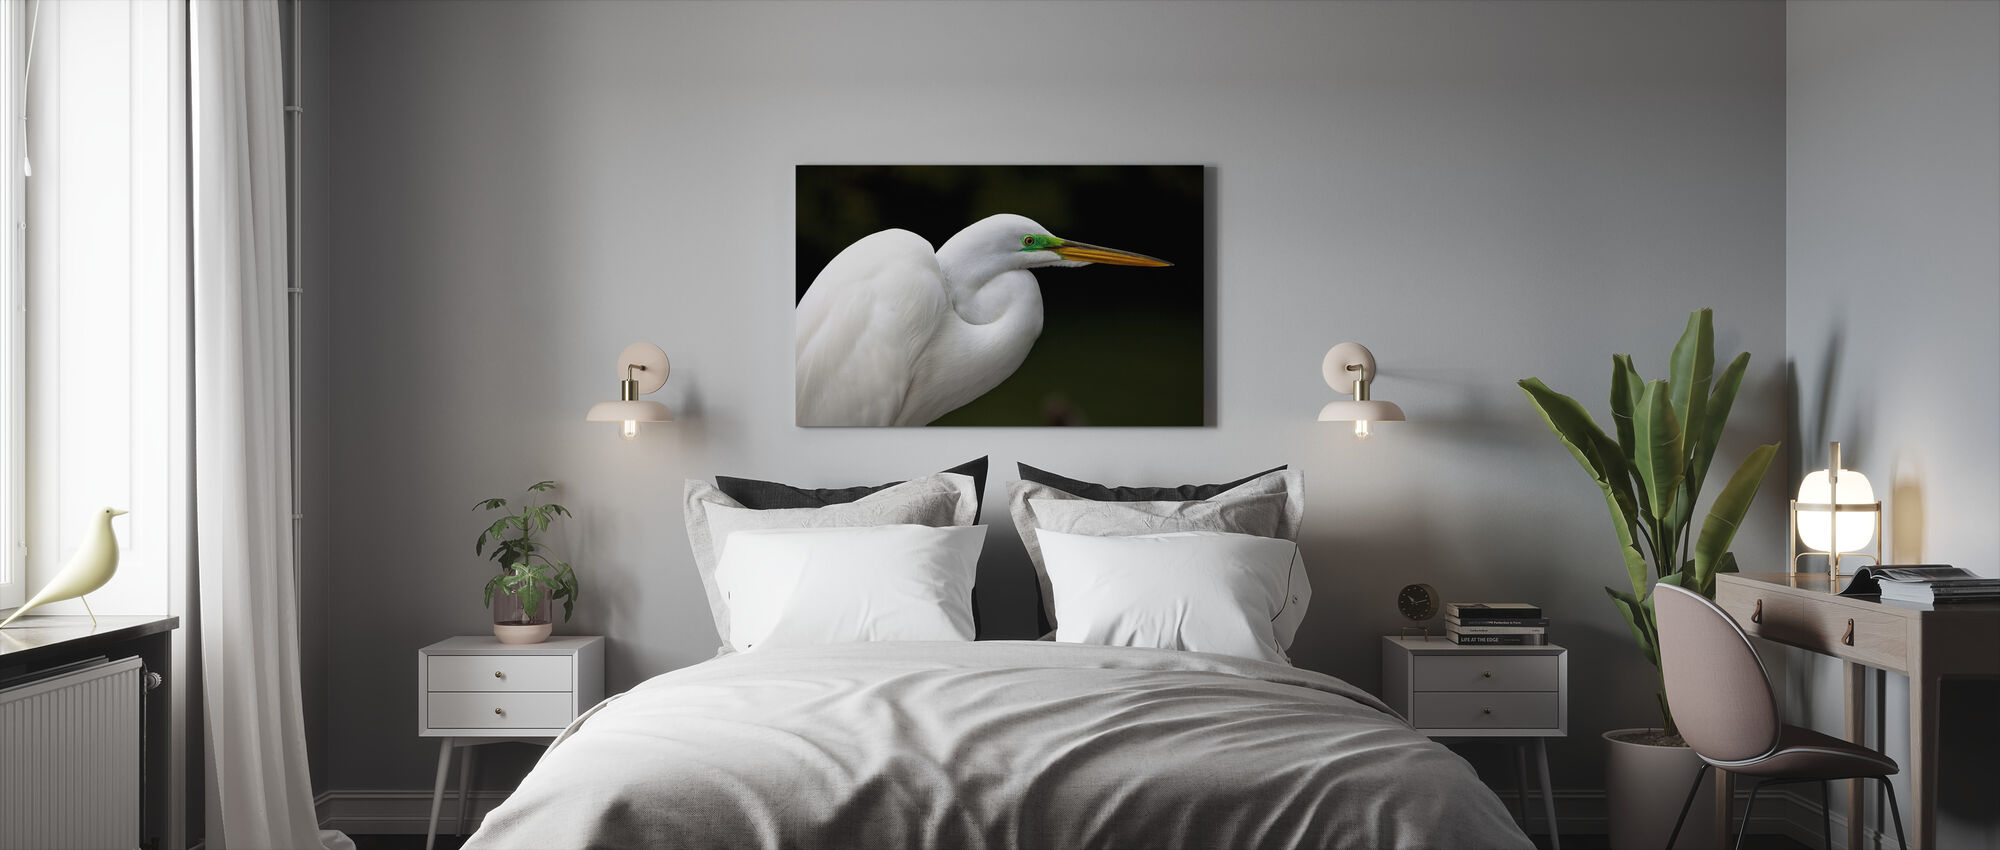 Great White Egret - Canvas print - Bedroom